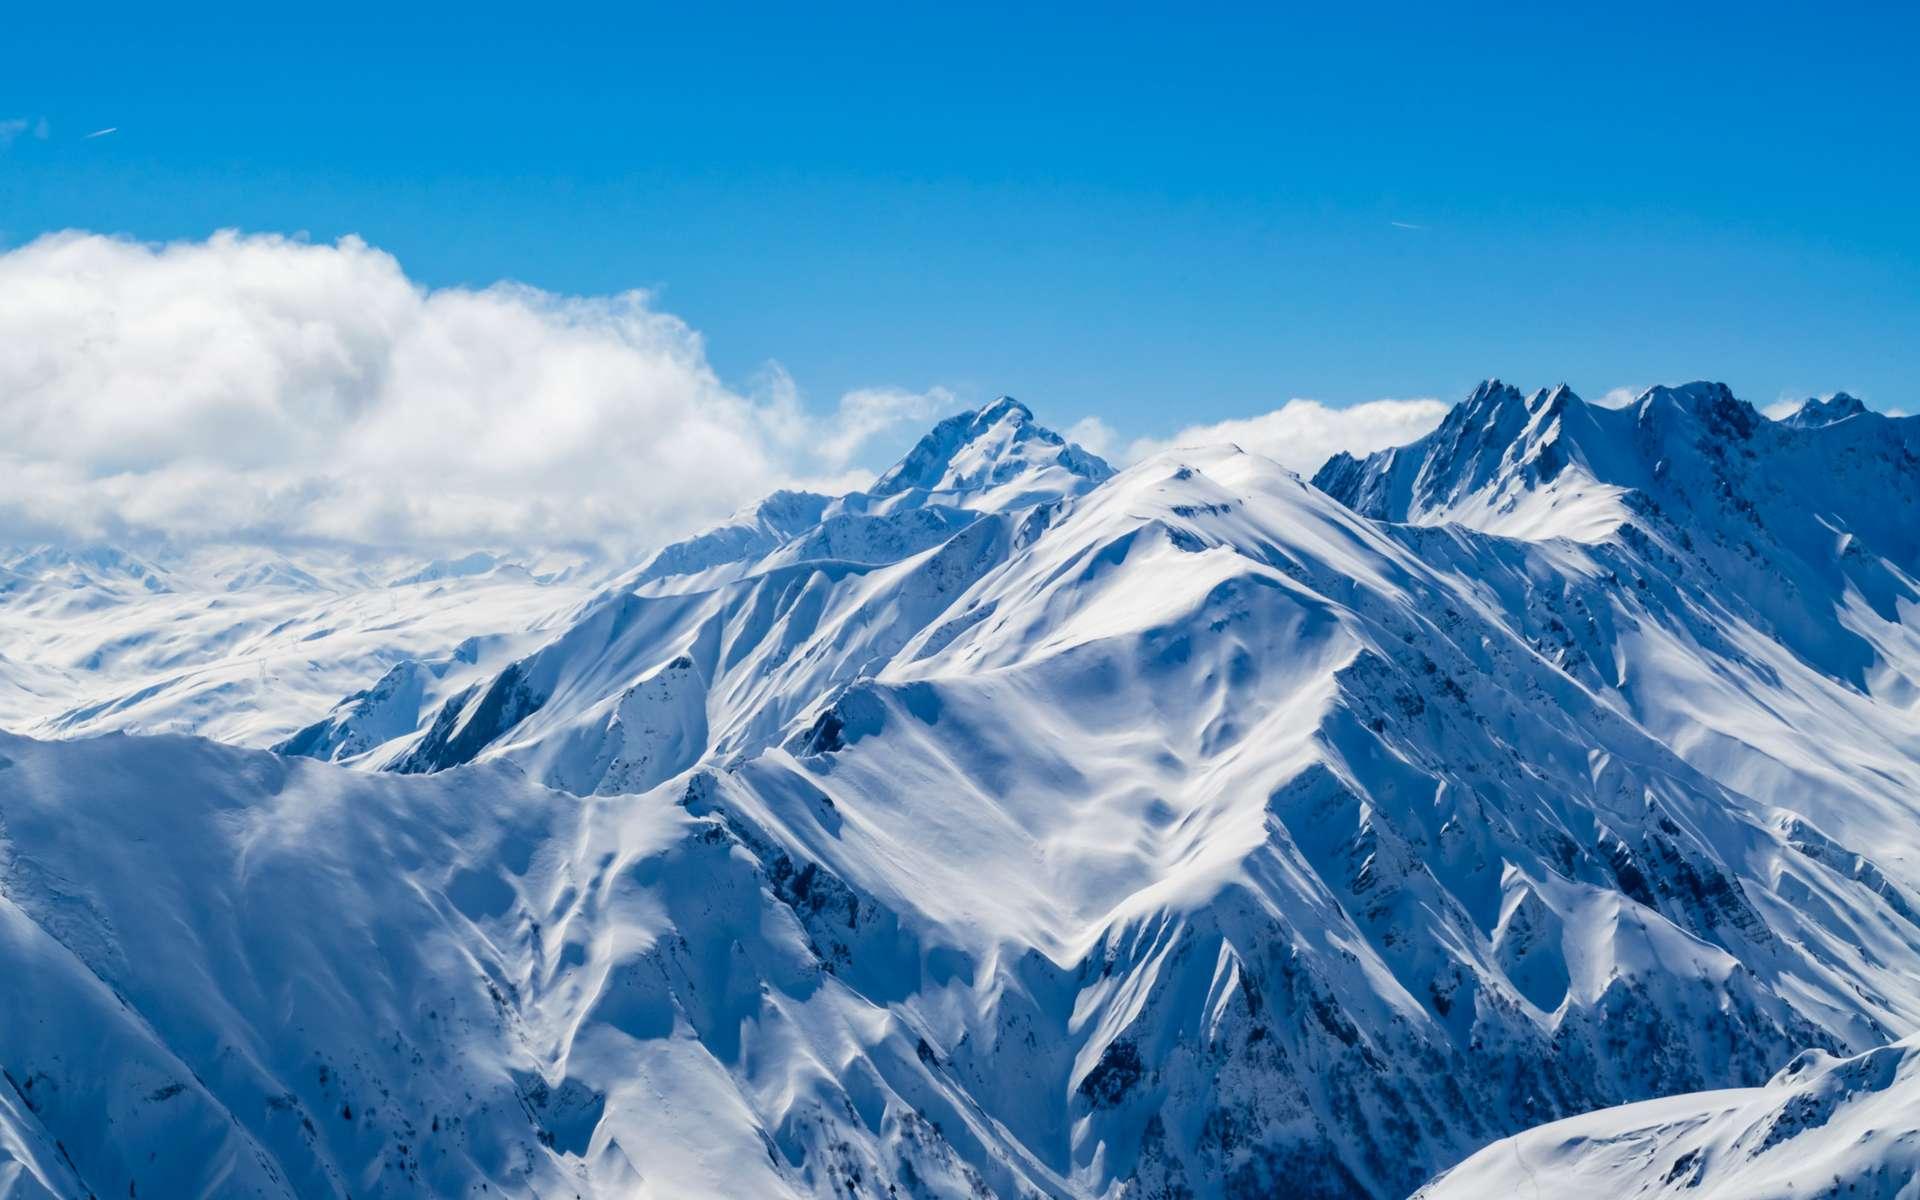 Le massif alpin a perdu un mois de neige depuis 1971. © Hakan Ozturk, Adobe Stock